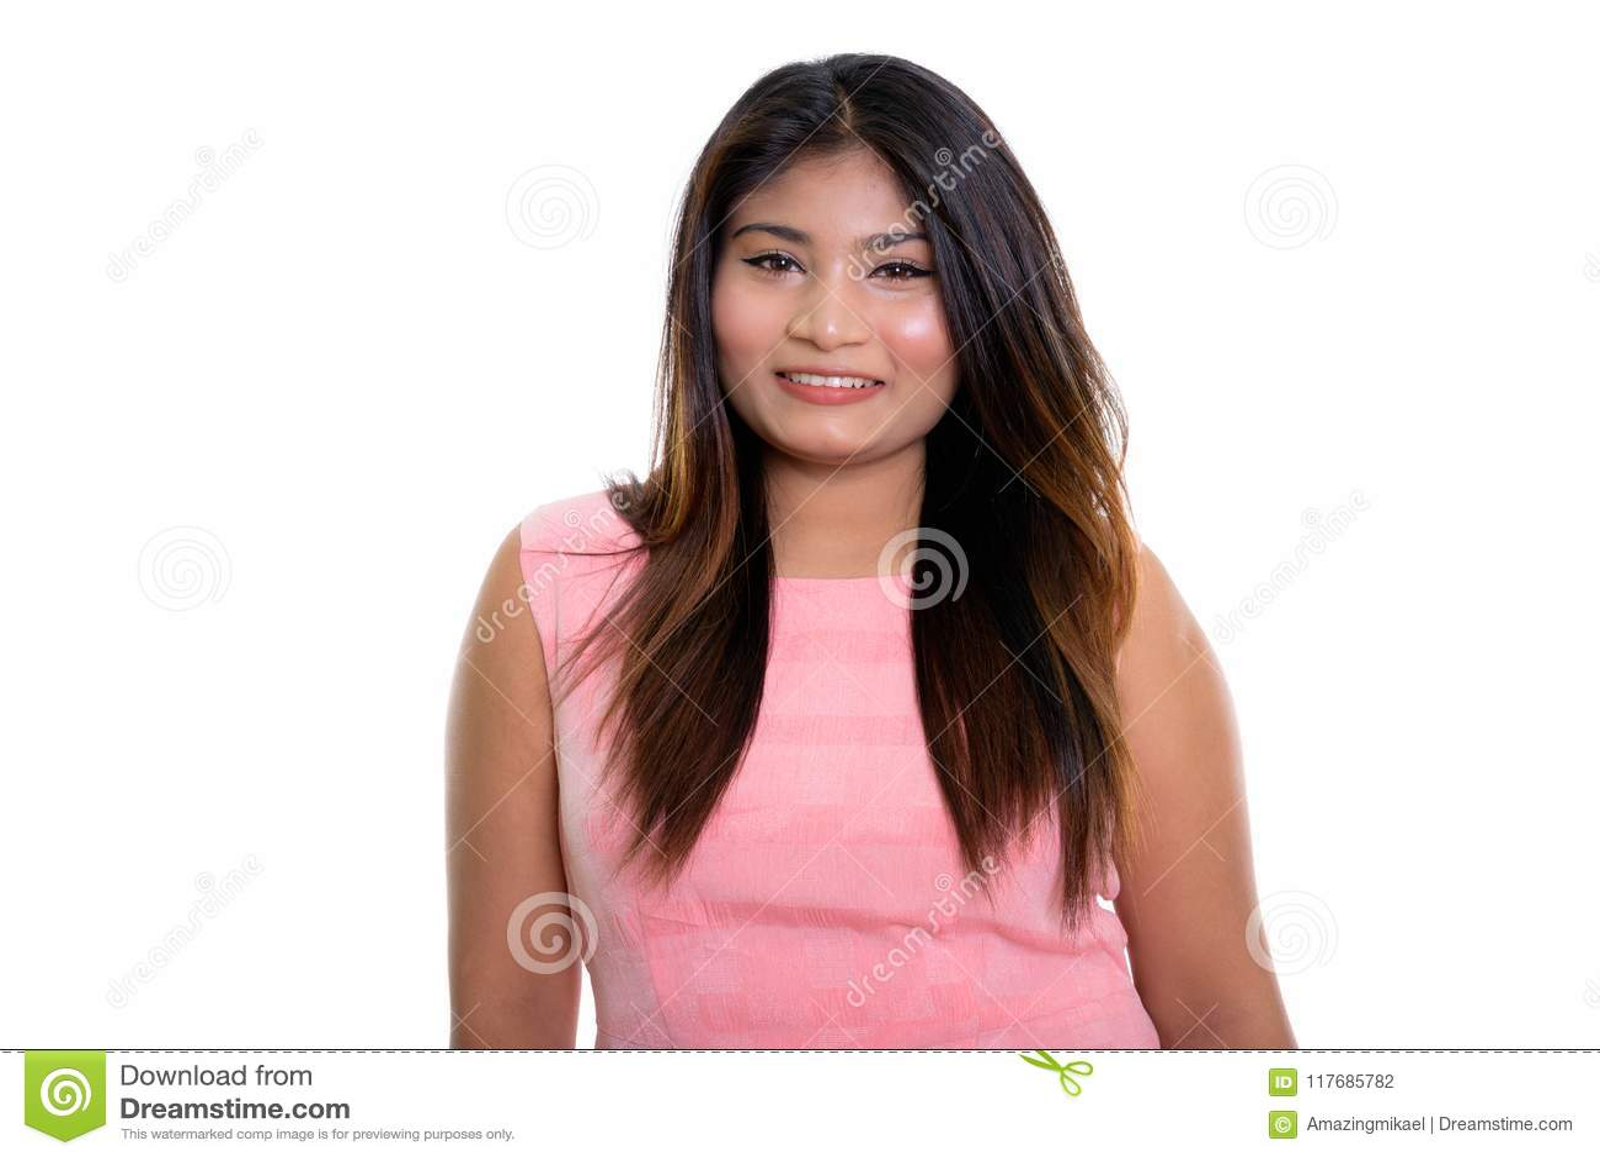 smiling Fat girl